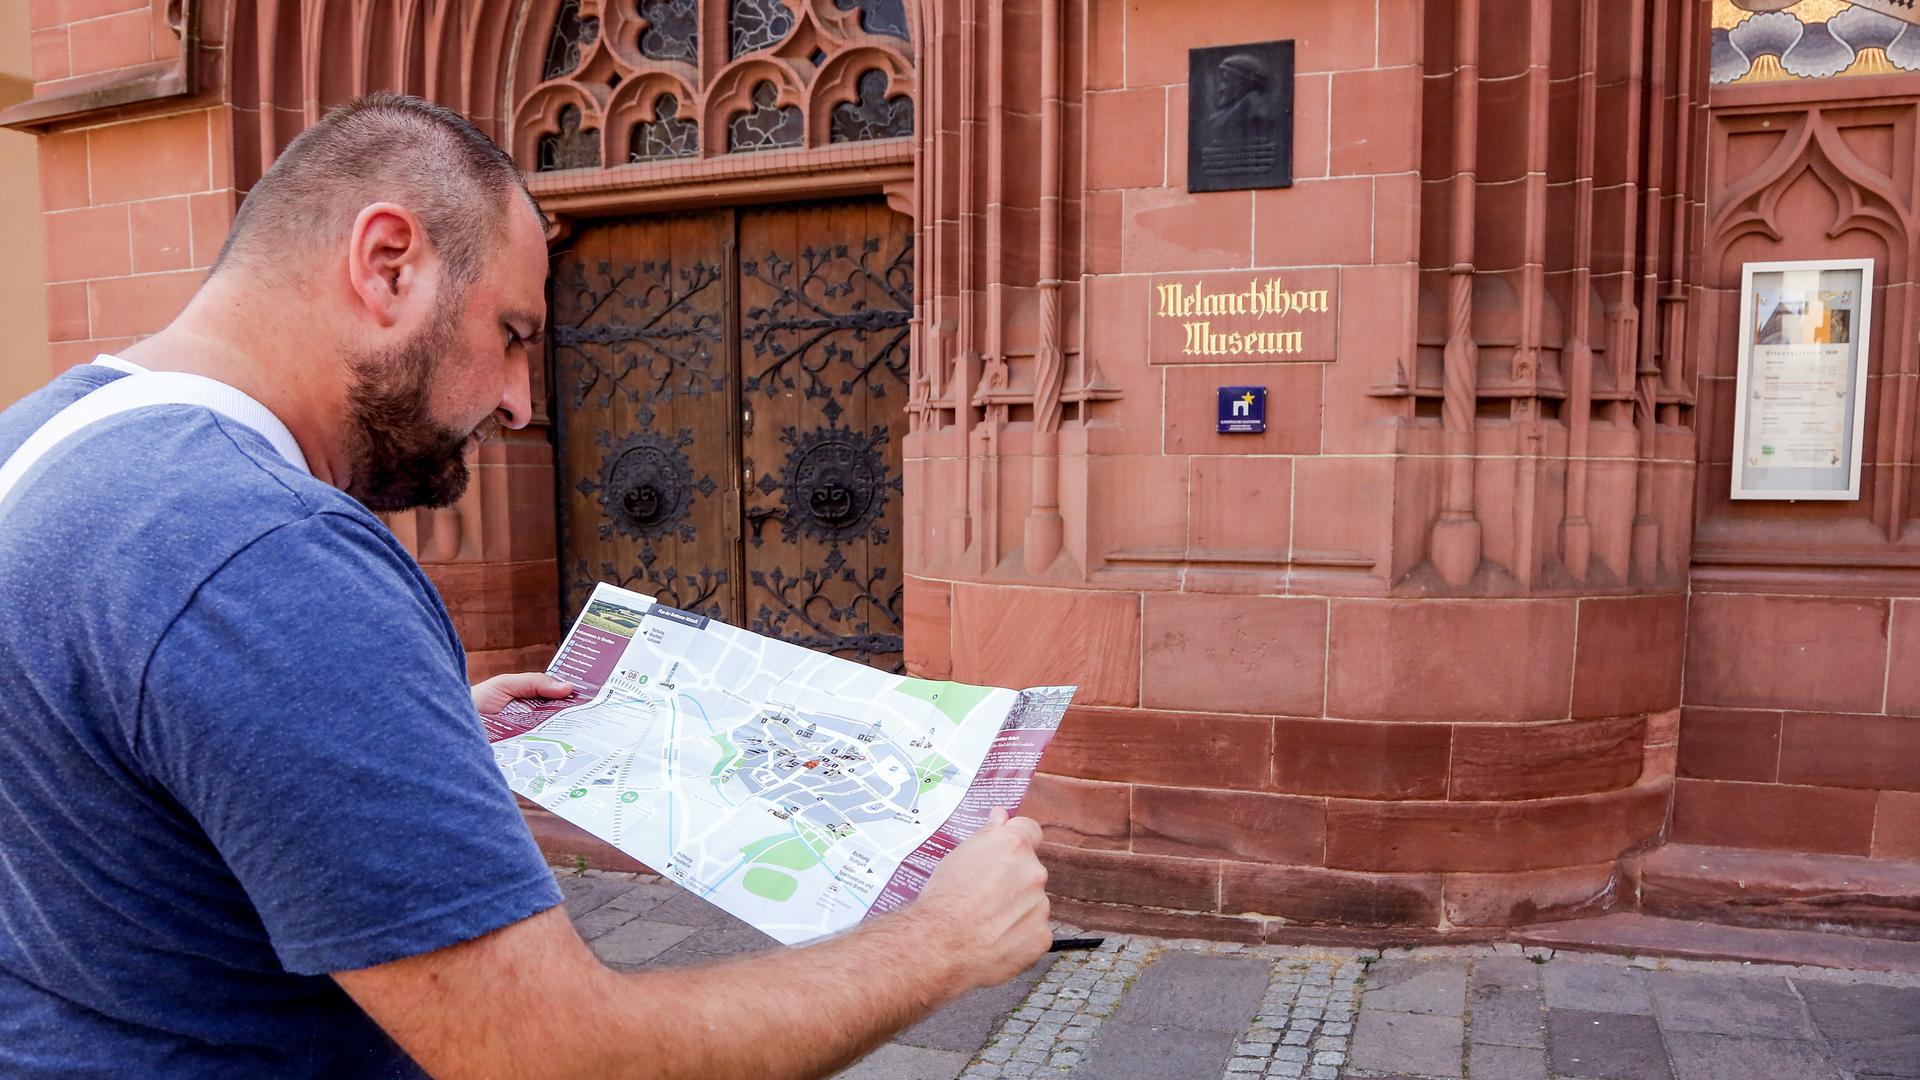 BNN-Redakteur Christof Bindschädel steht mit Stadtplan vor dem Melanchthon-Museum . Foto: Tom Rebel